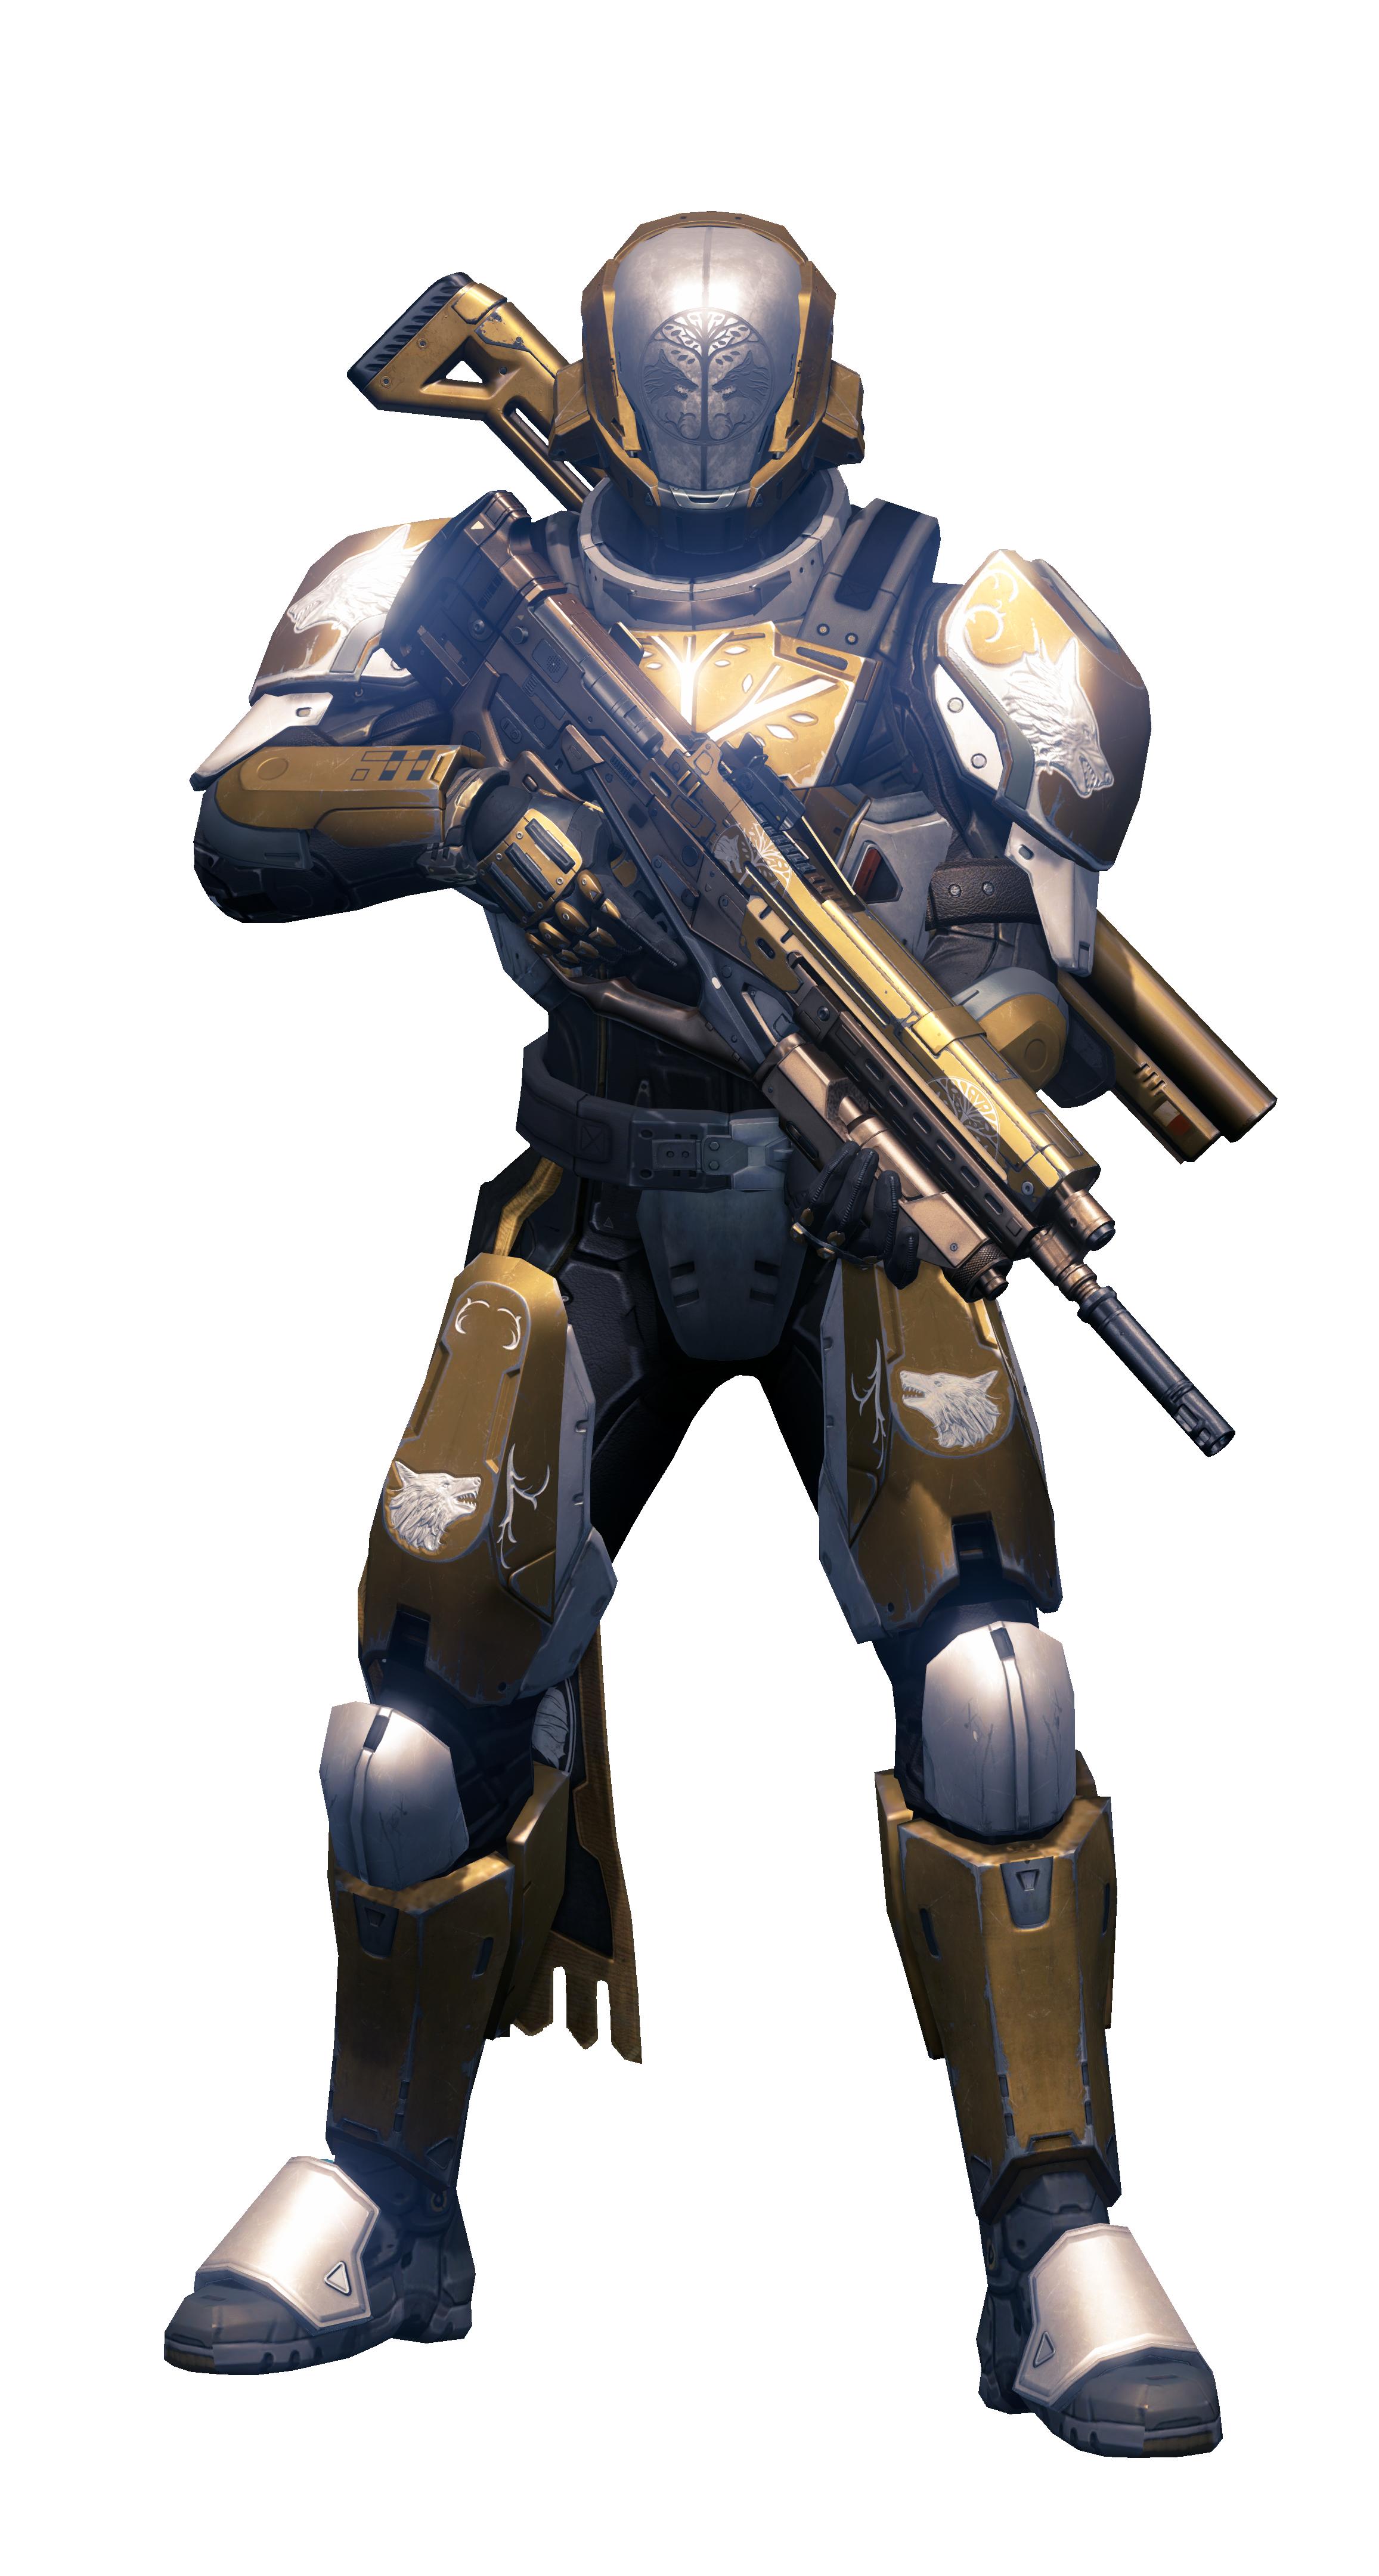 All Destiny screenshots released at Gamescom, high-res ...